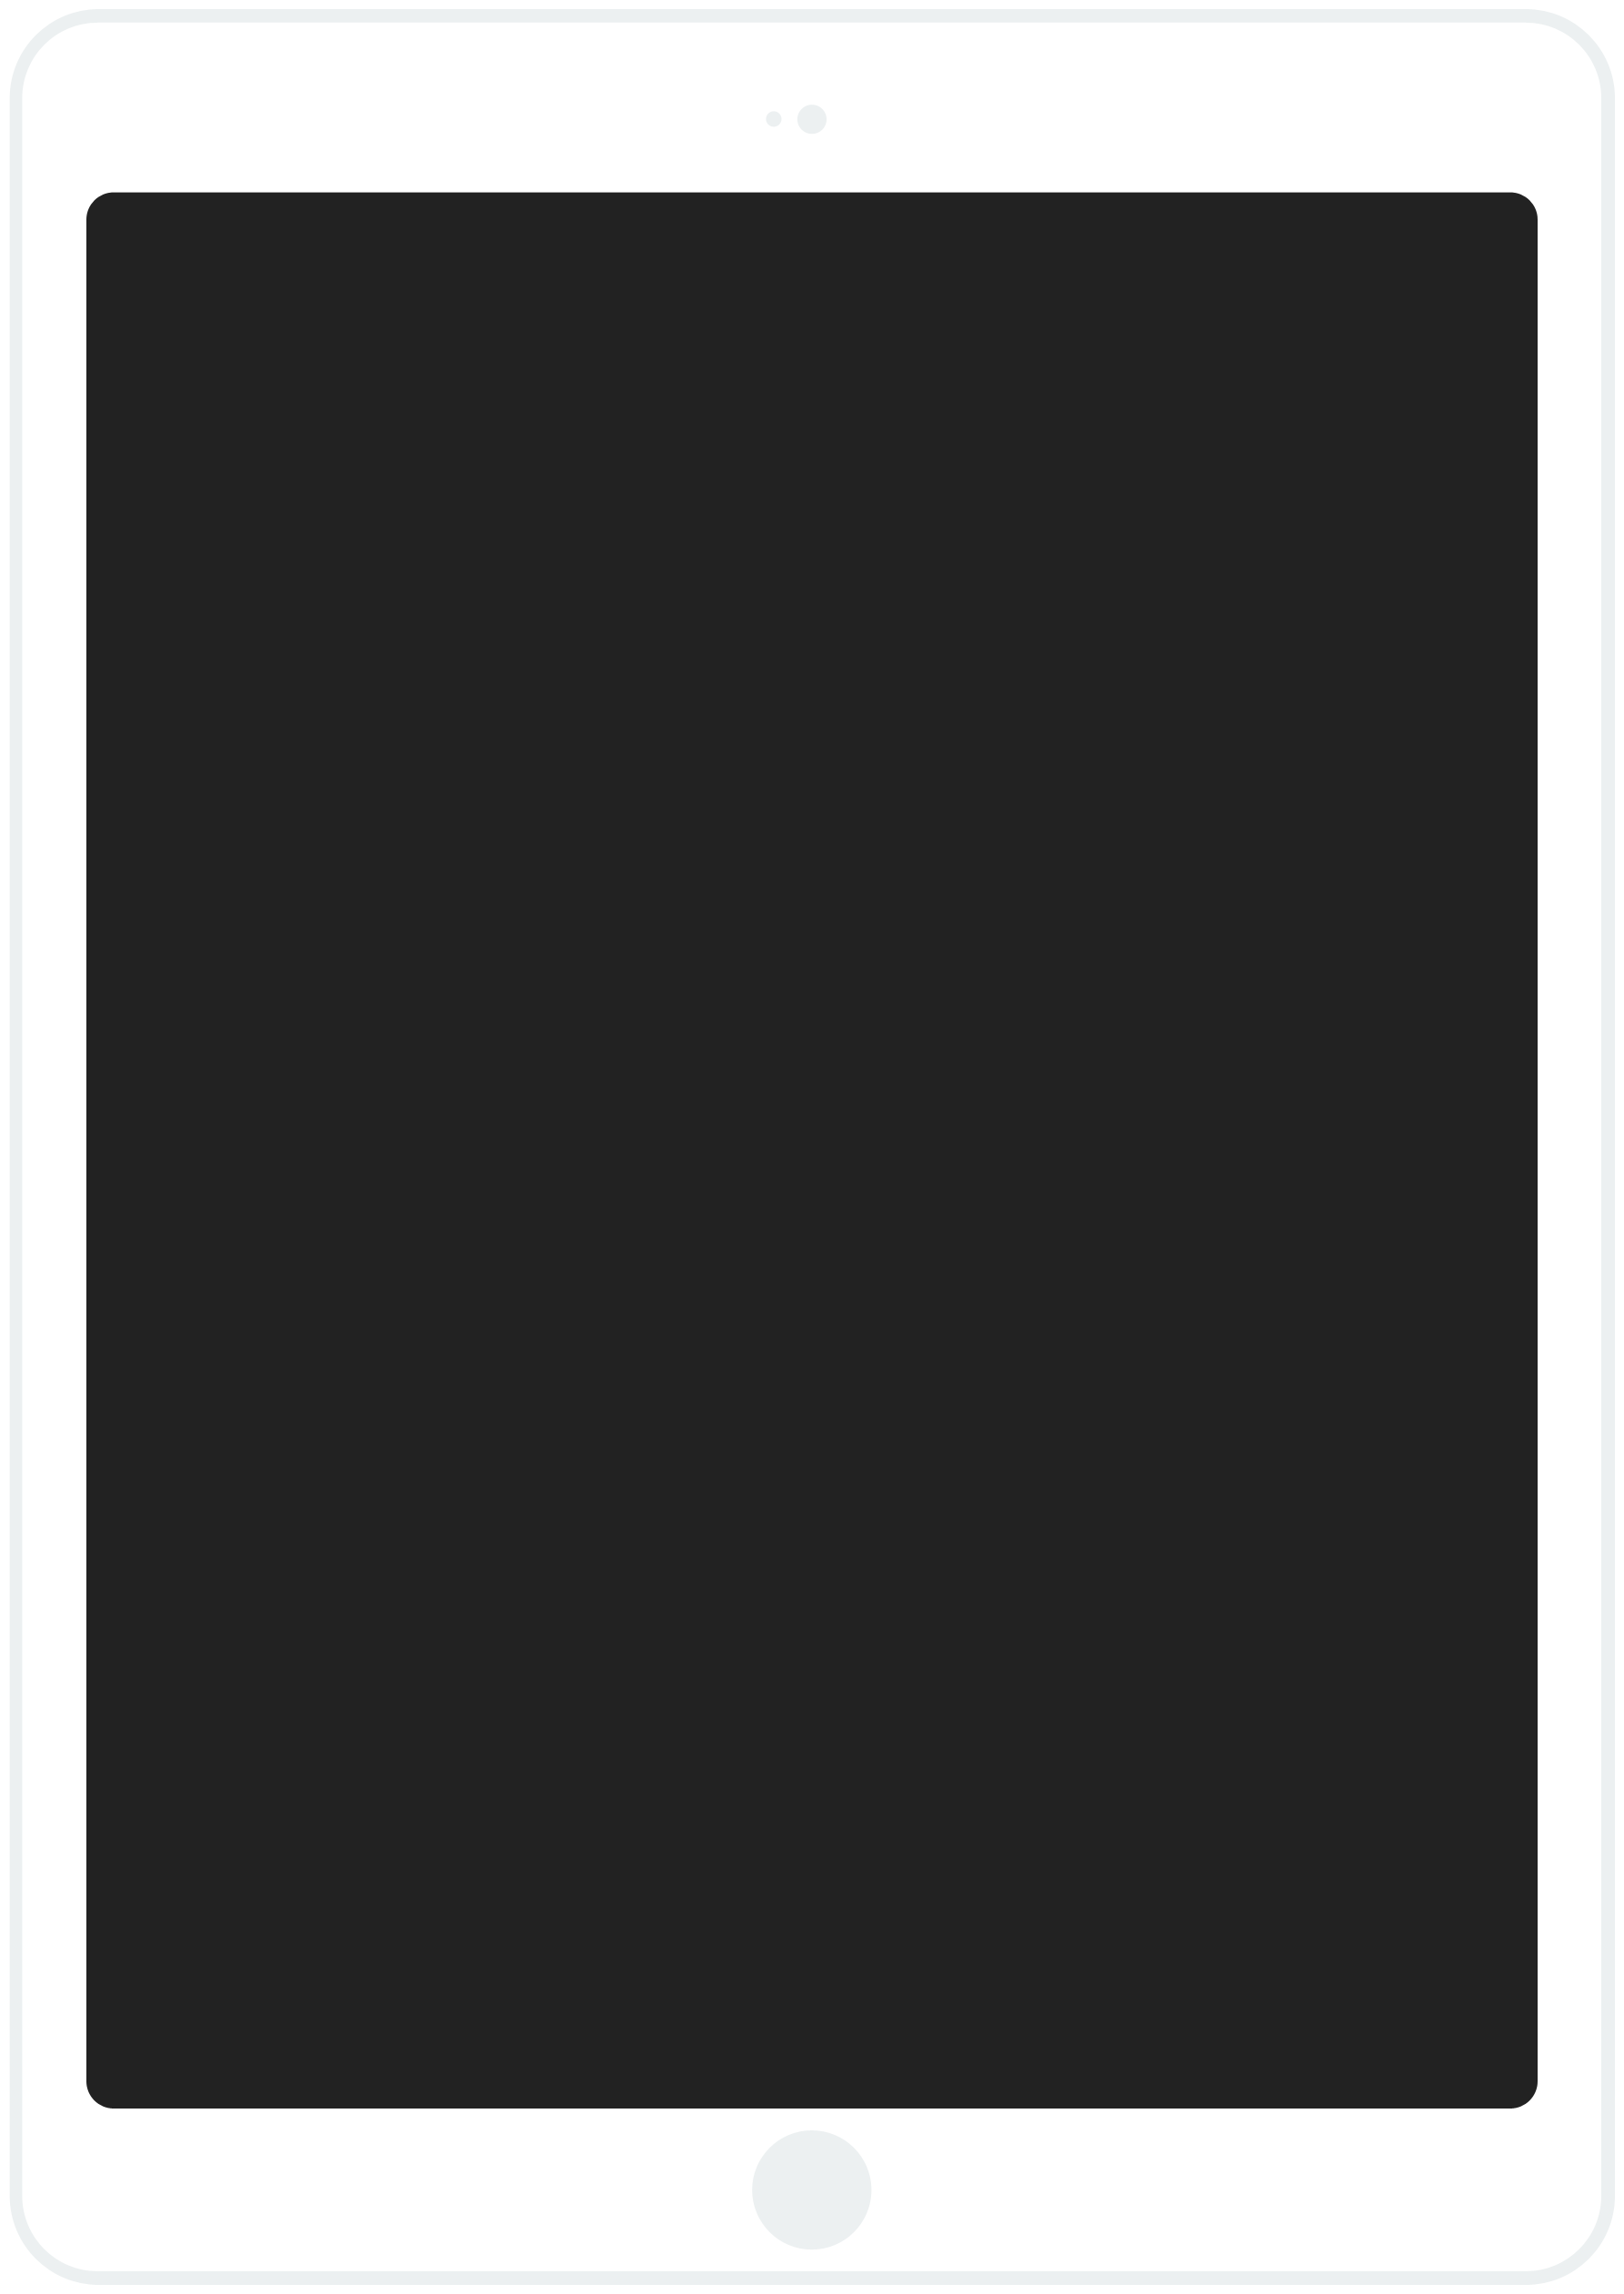 ipad background